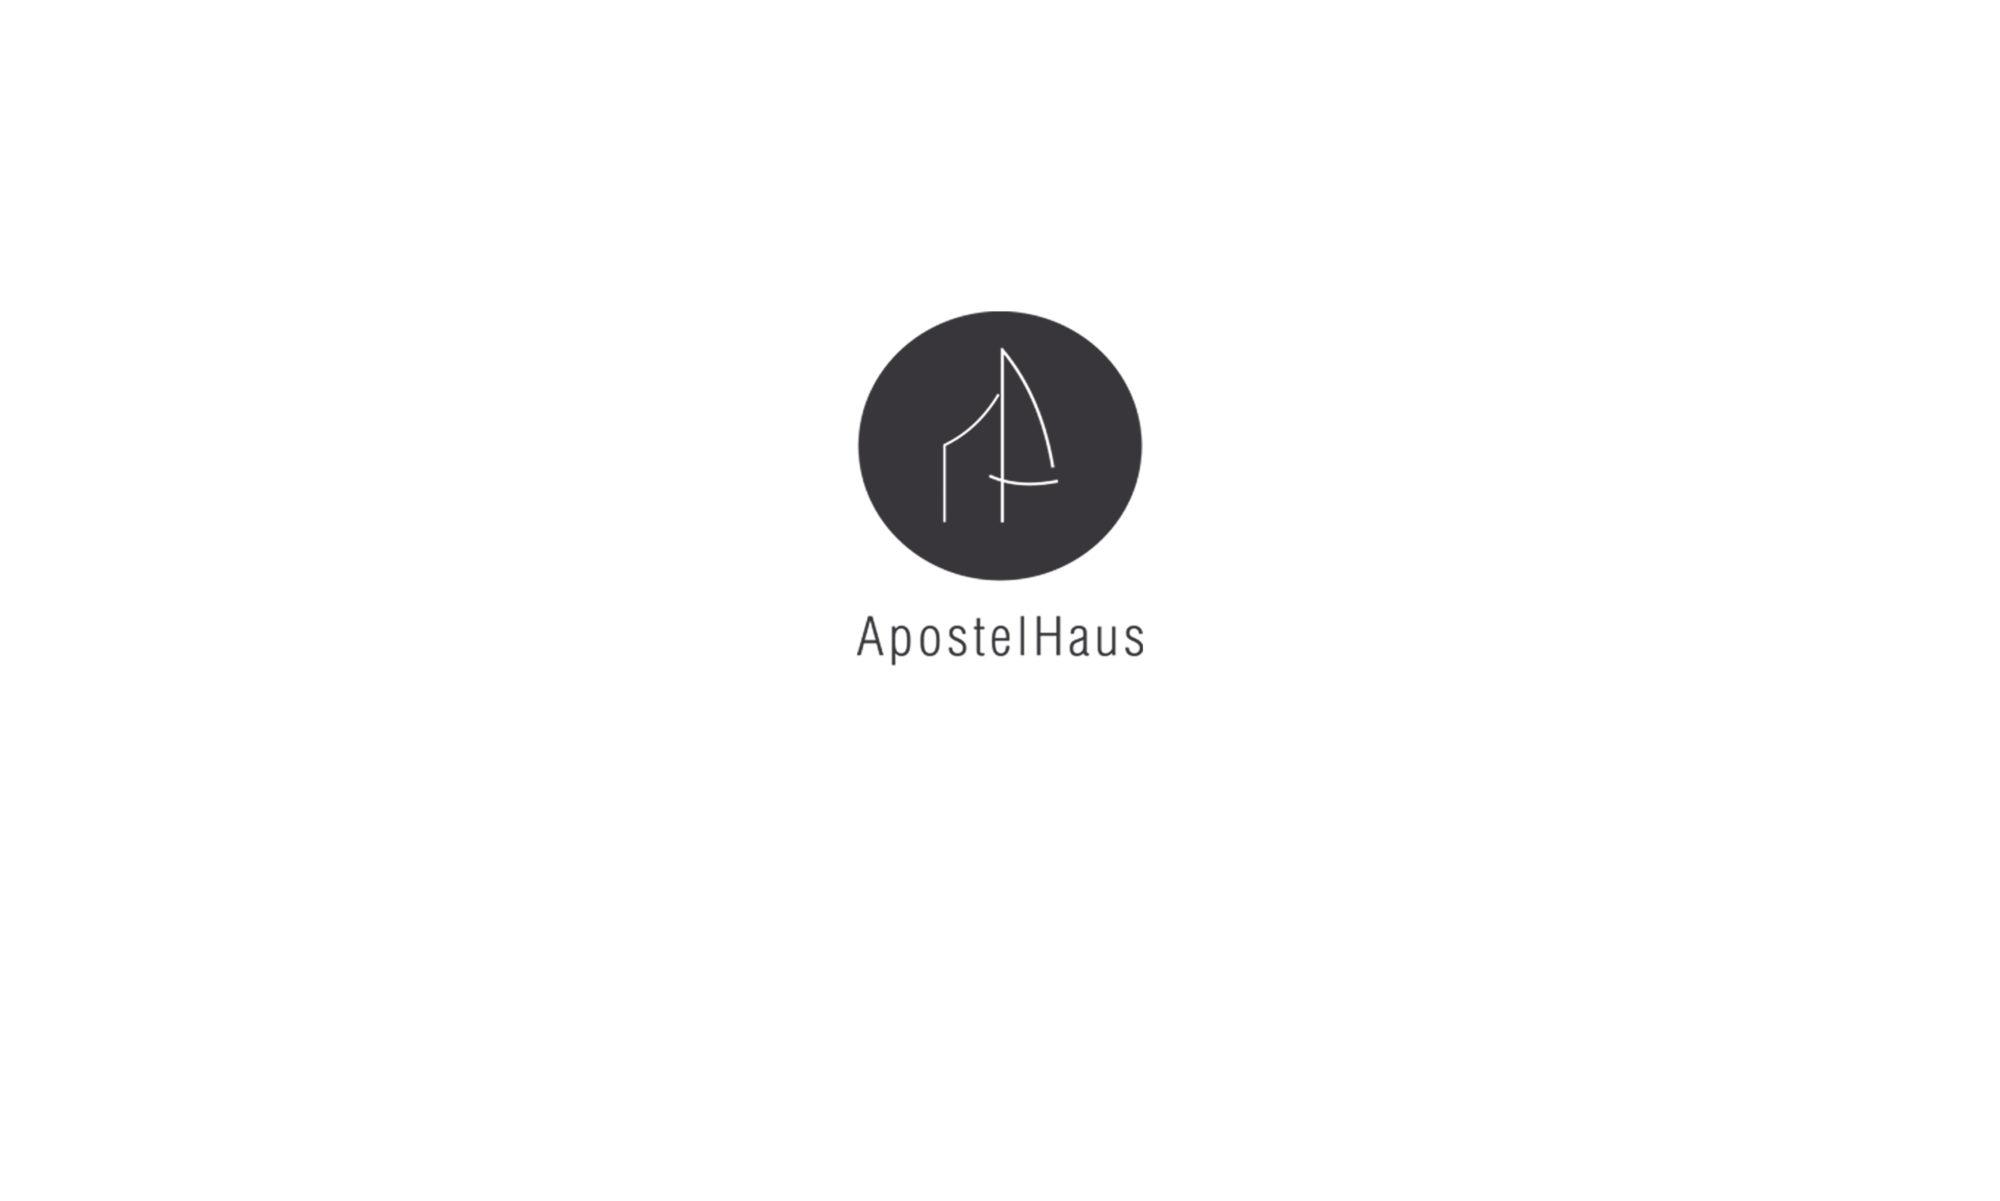 ApostelHaus Ratingen